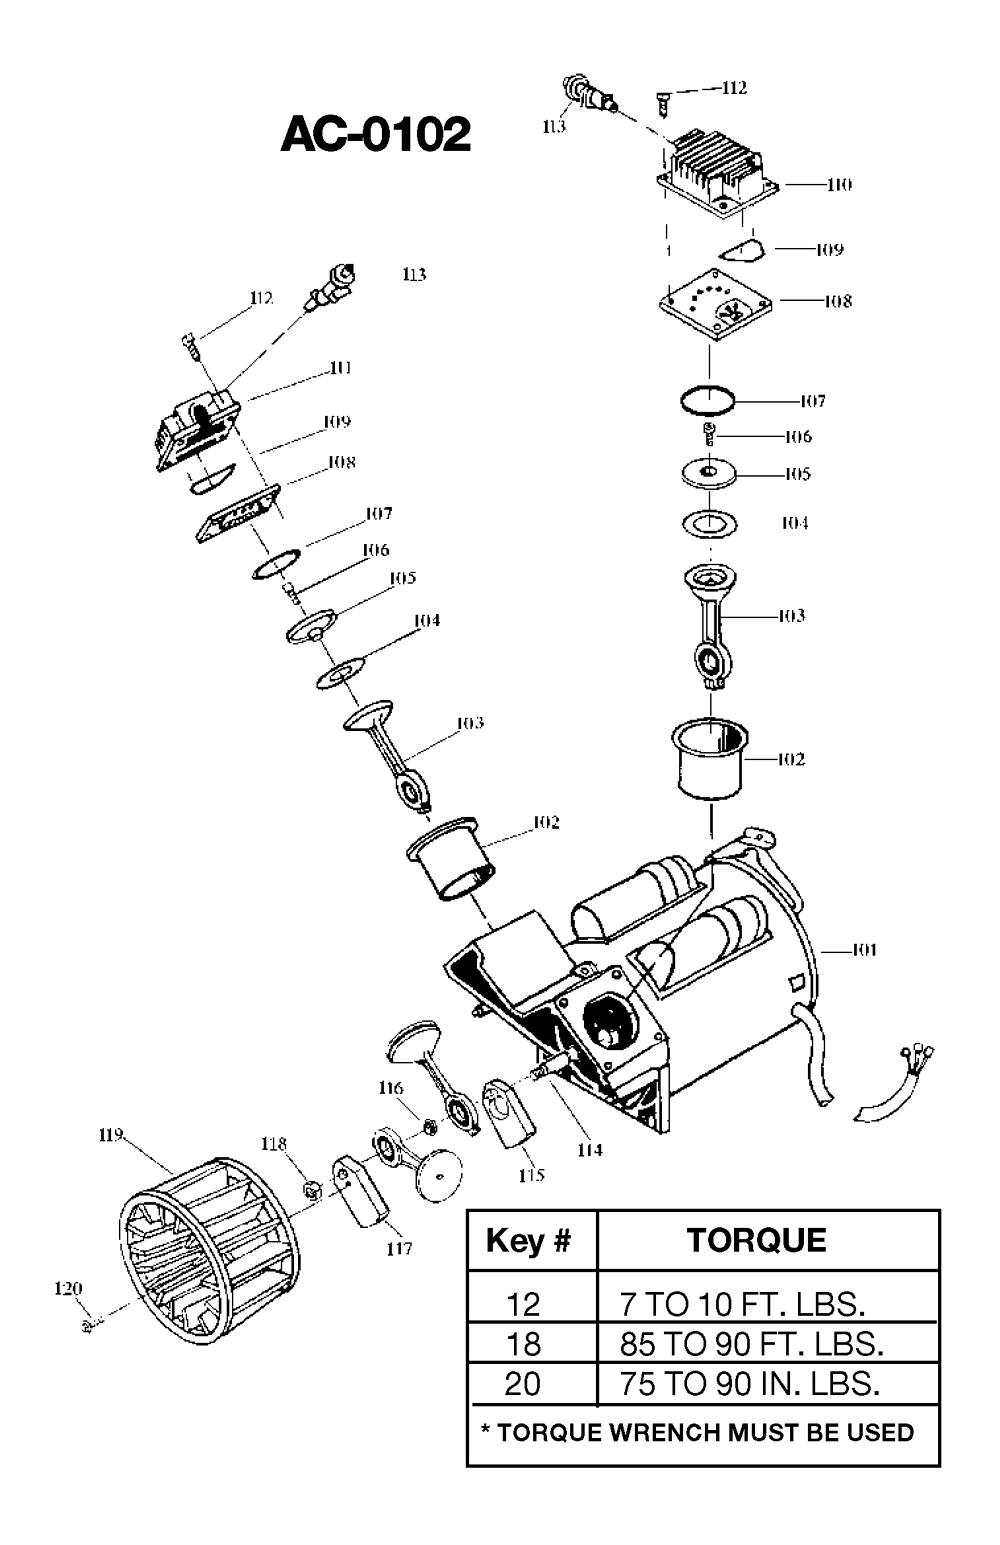 IR500TVE60V-Devilbiss-T3-PB-1Break Down